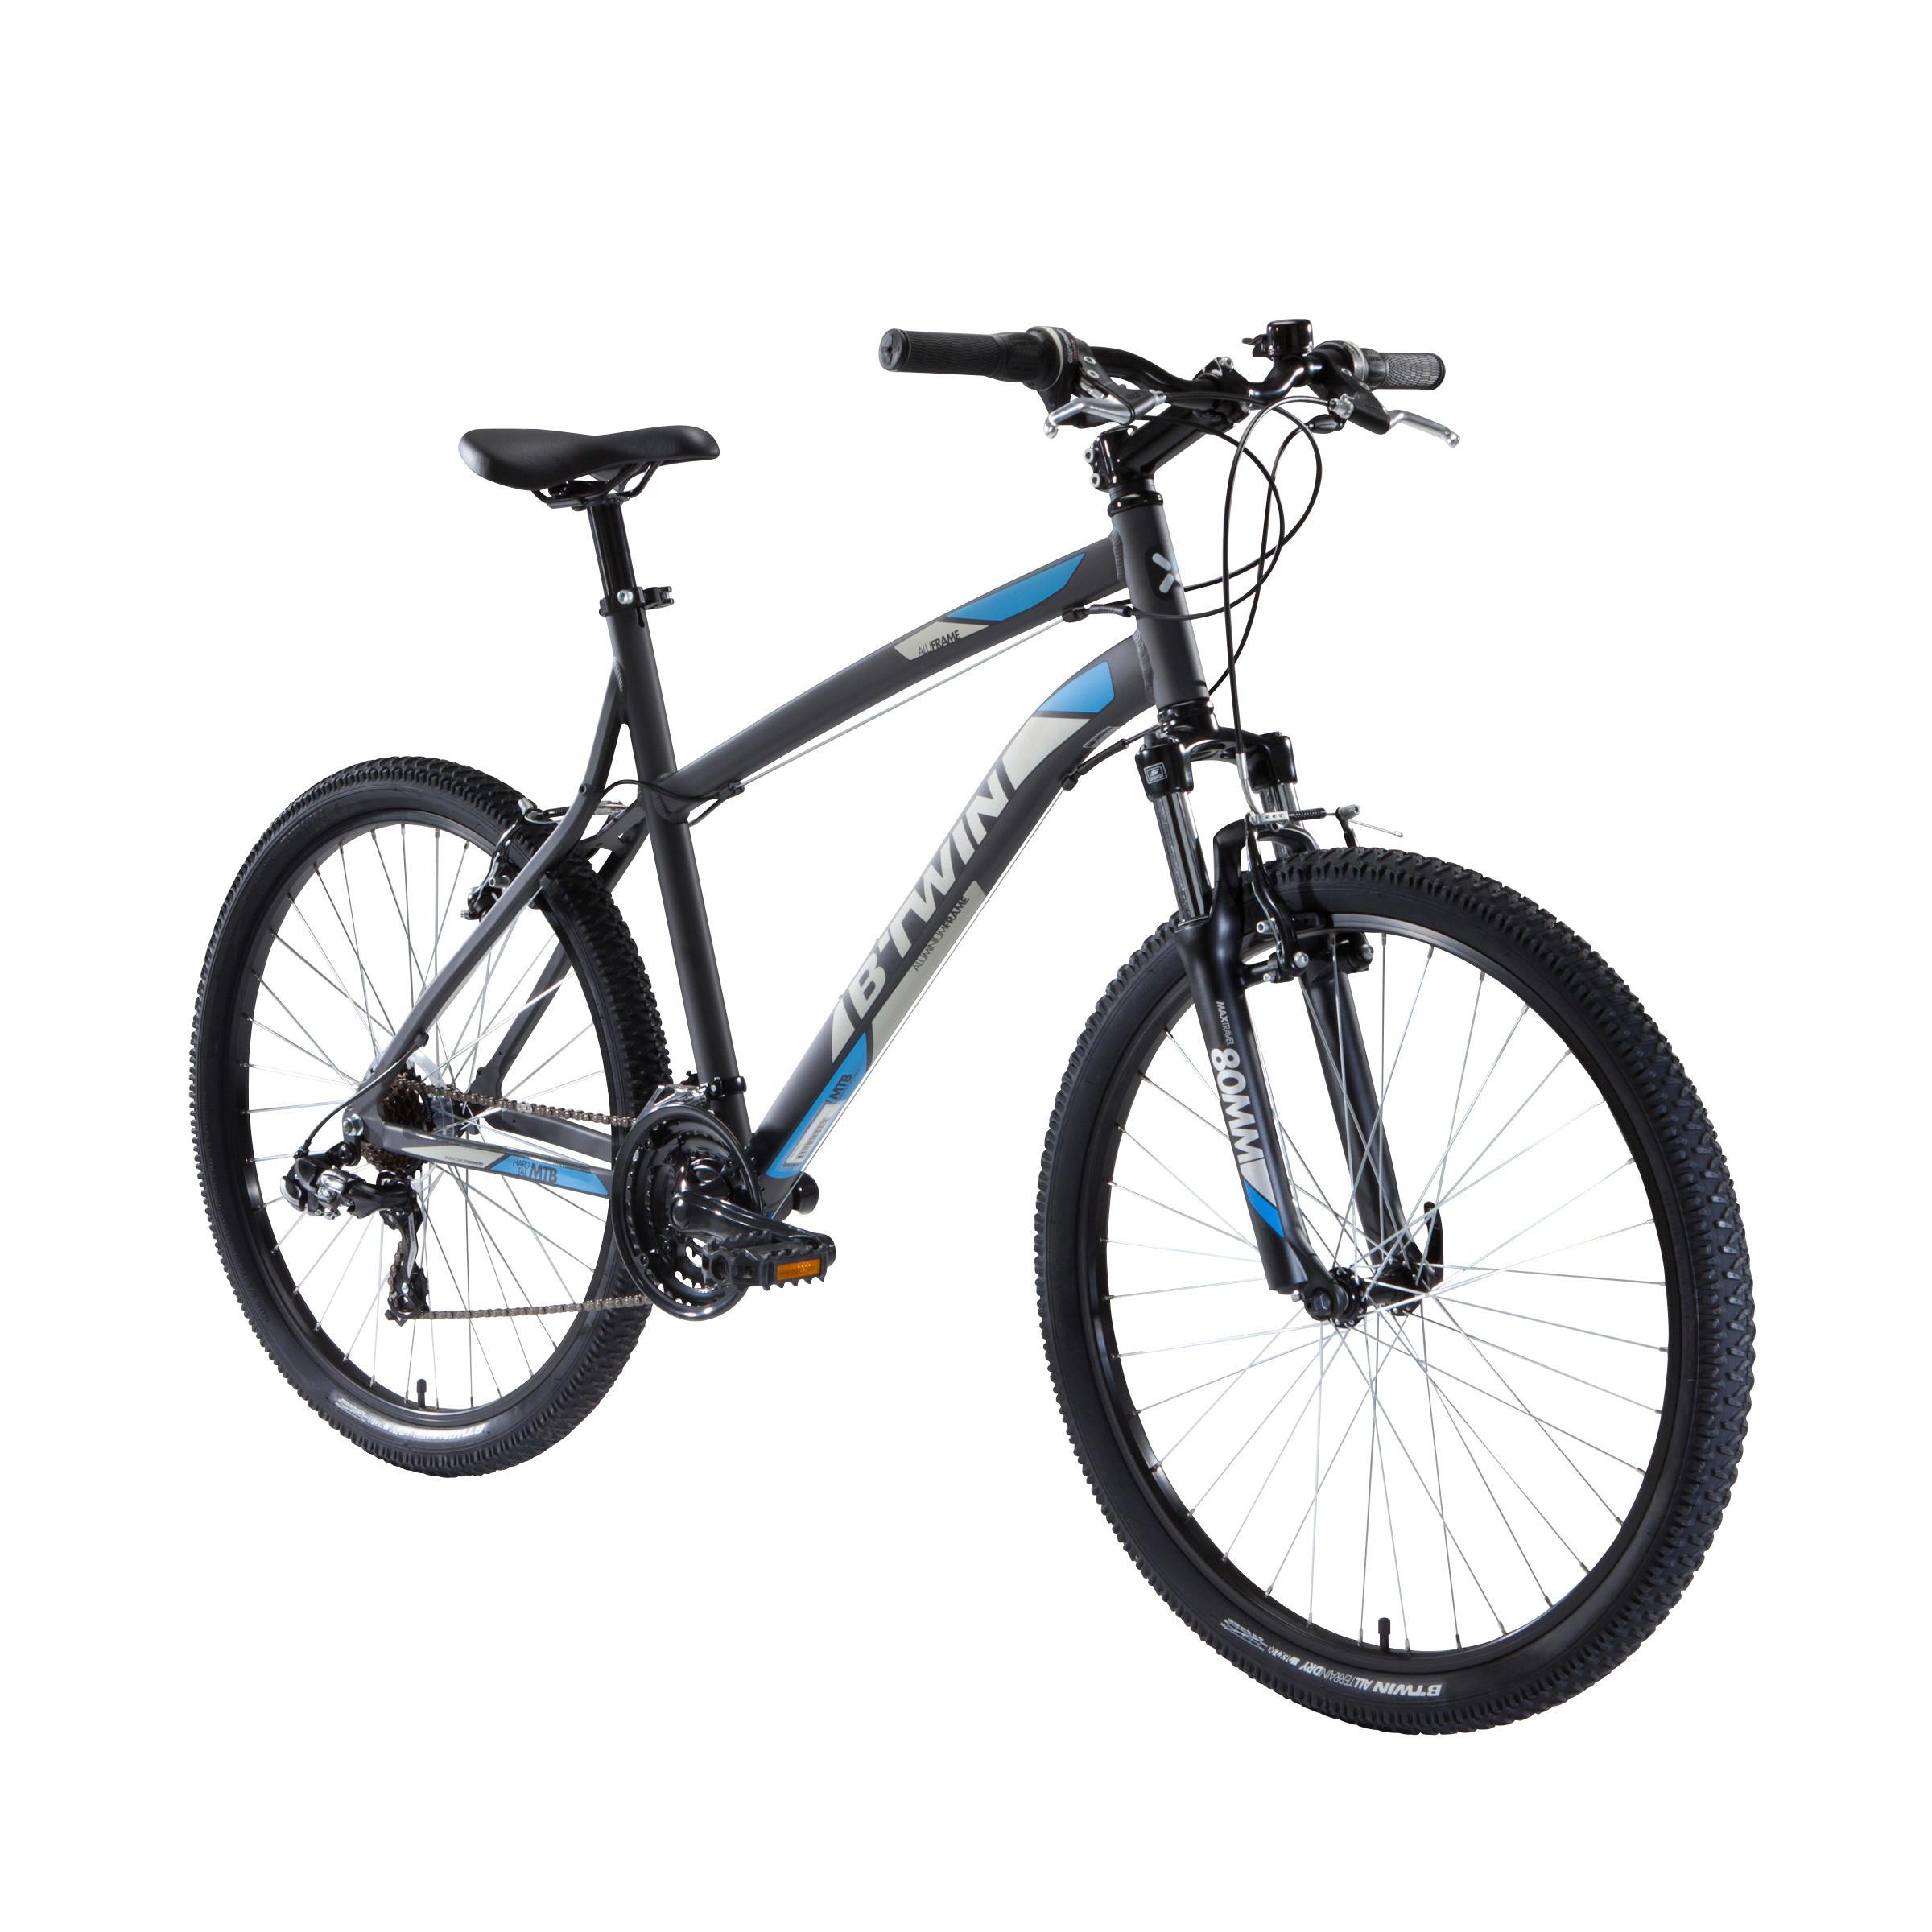 ▷ Mountainbike verlichting kopen? | Online Internetwinkel